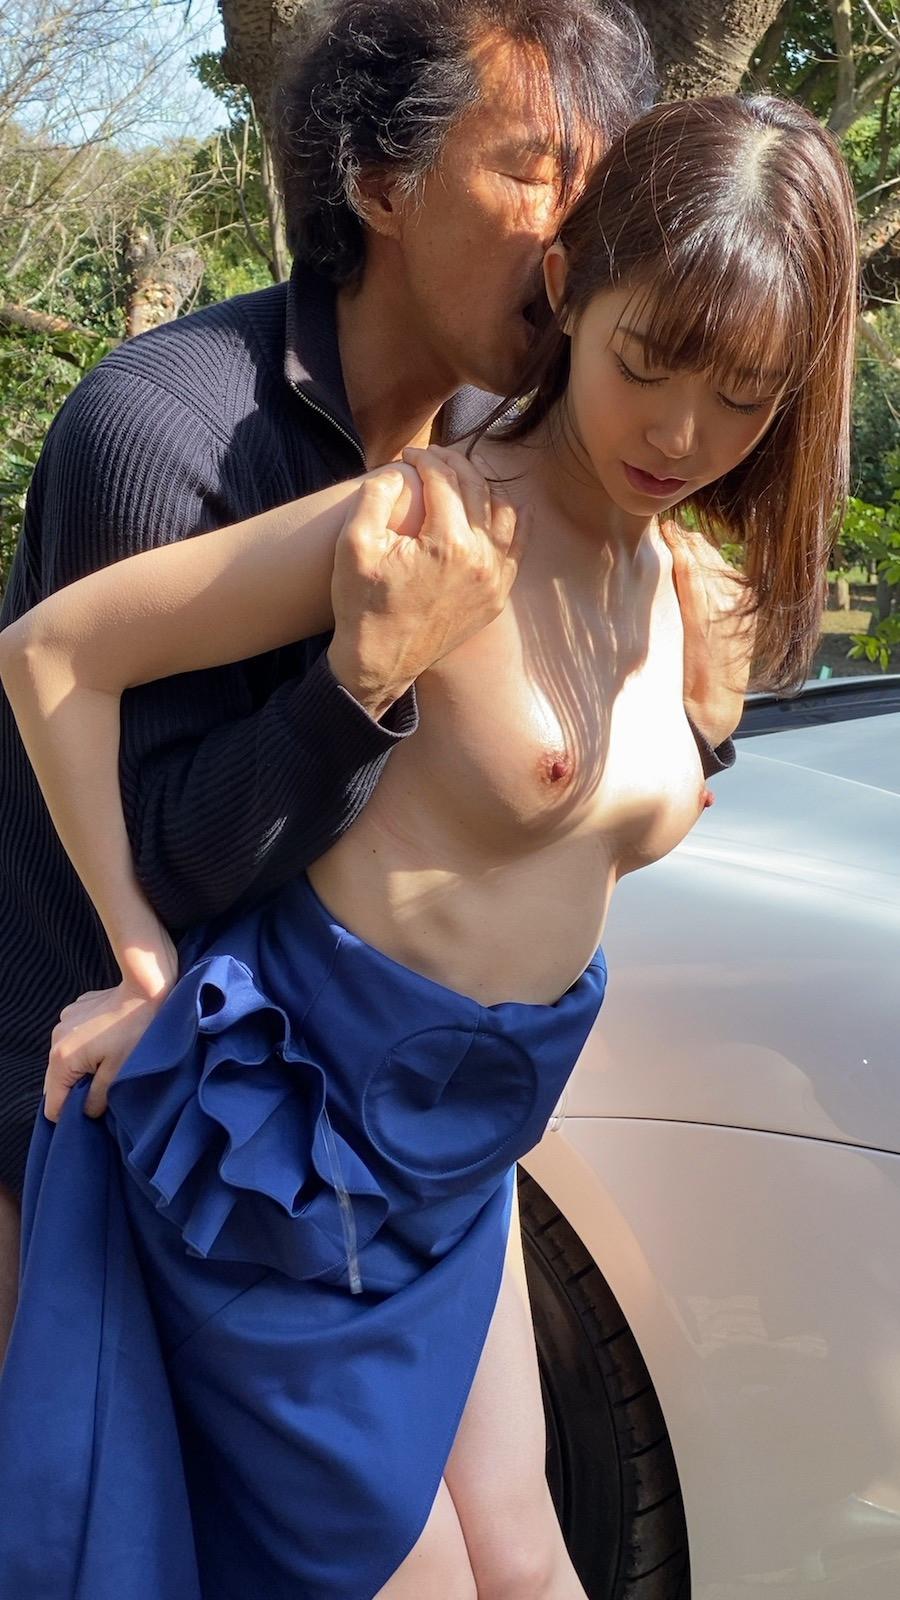 HIGH END CAR SEX 黒川すみれ 画像10